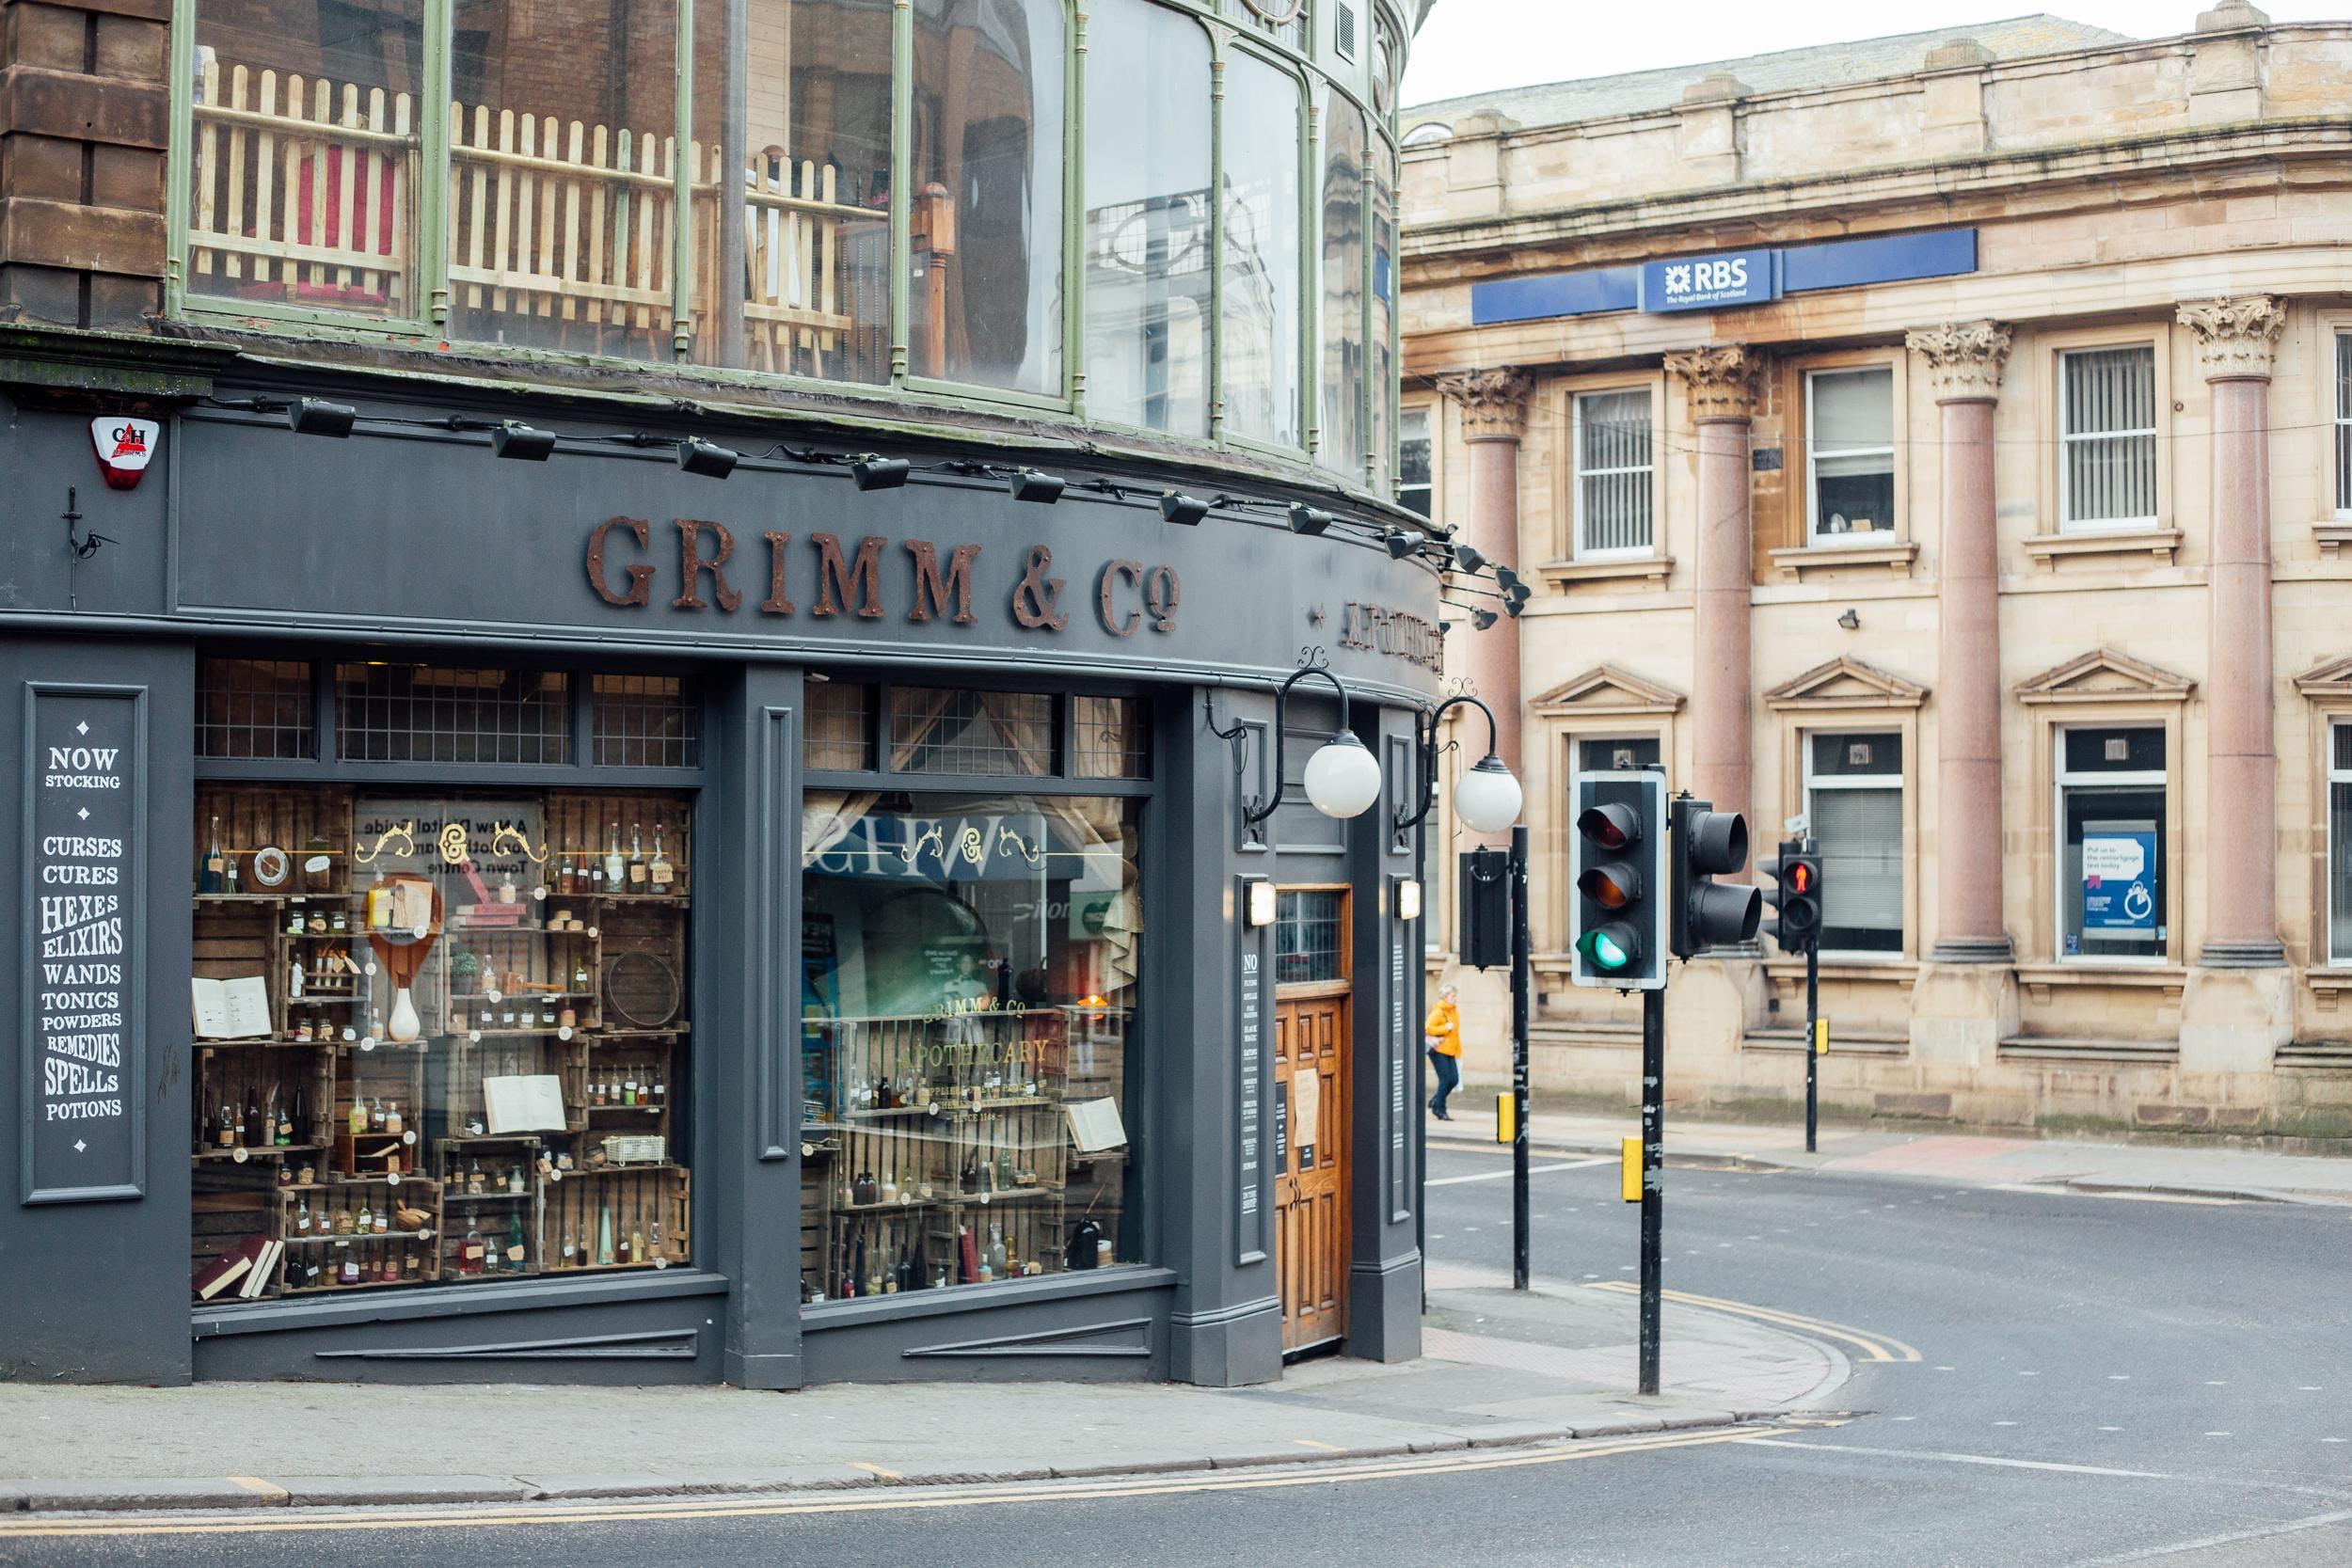 Grimm & Co, Rotherham, United Kingdom